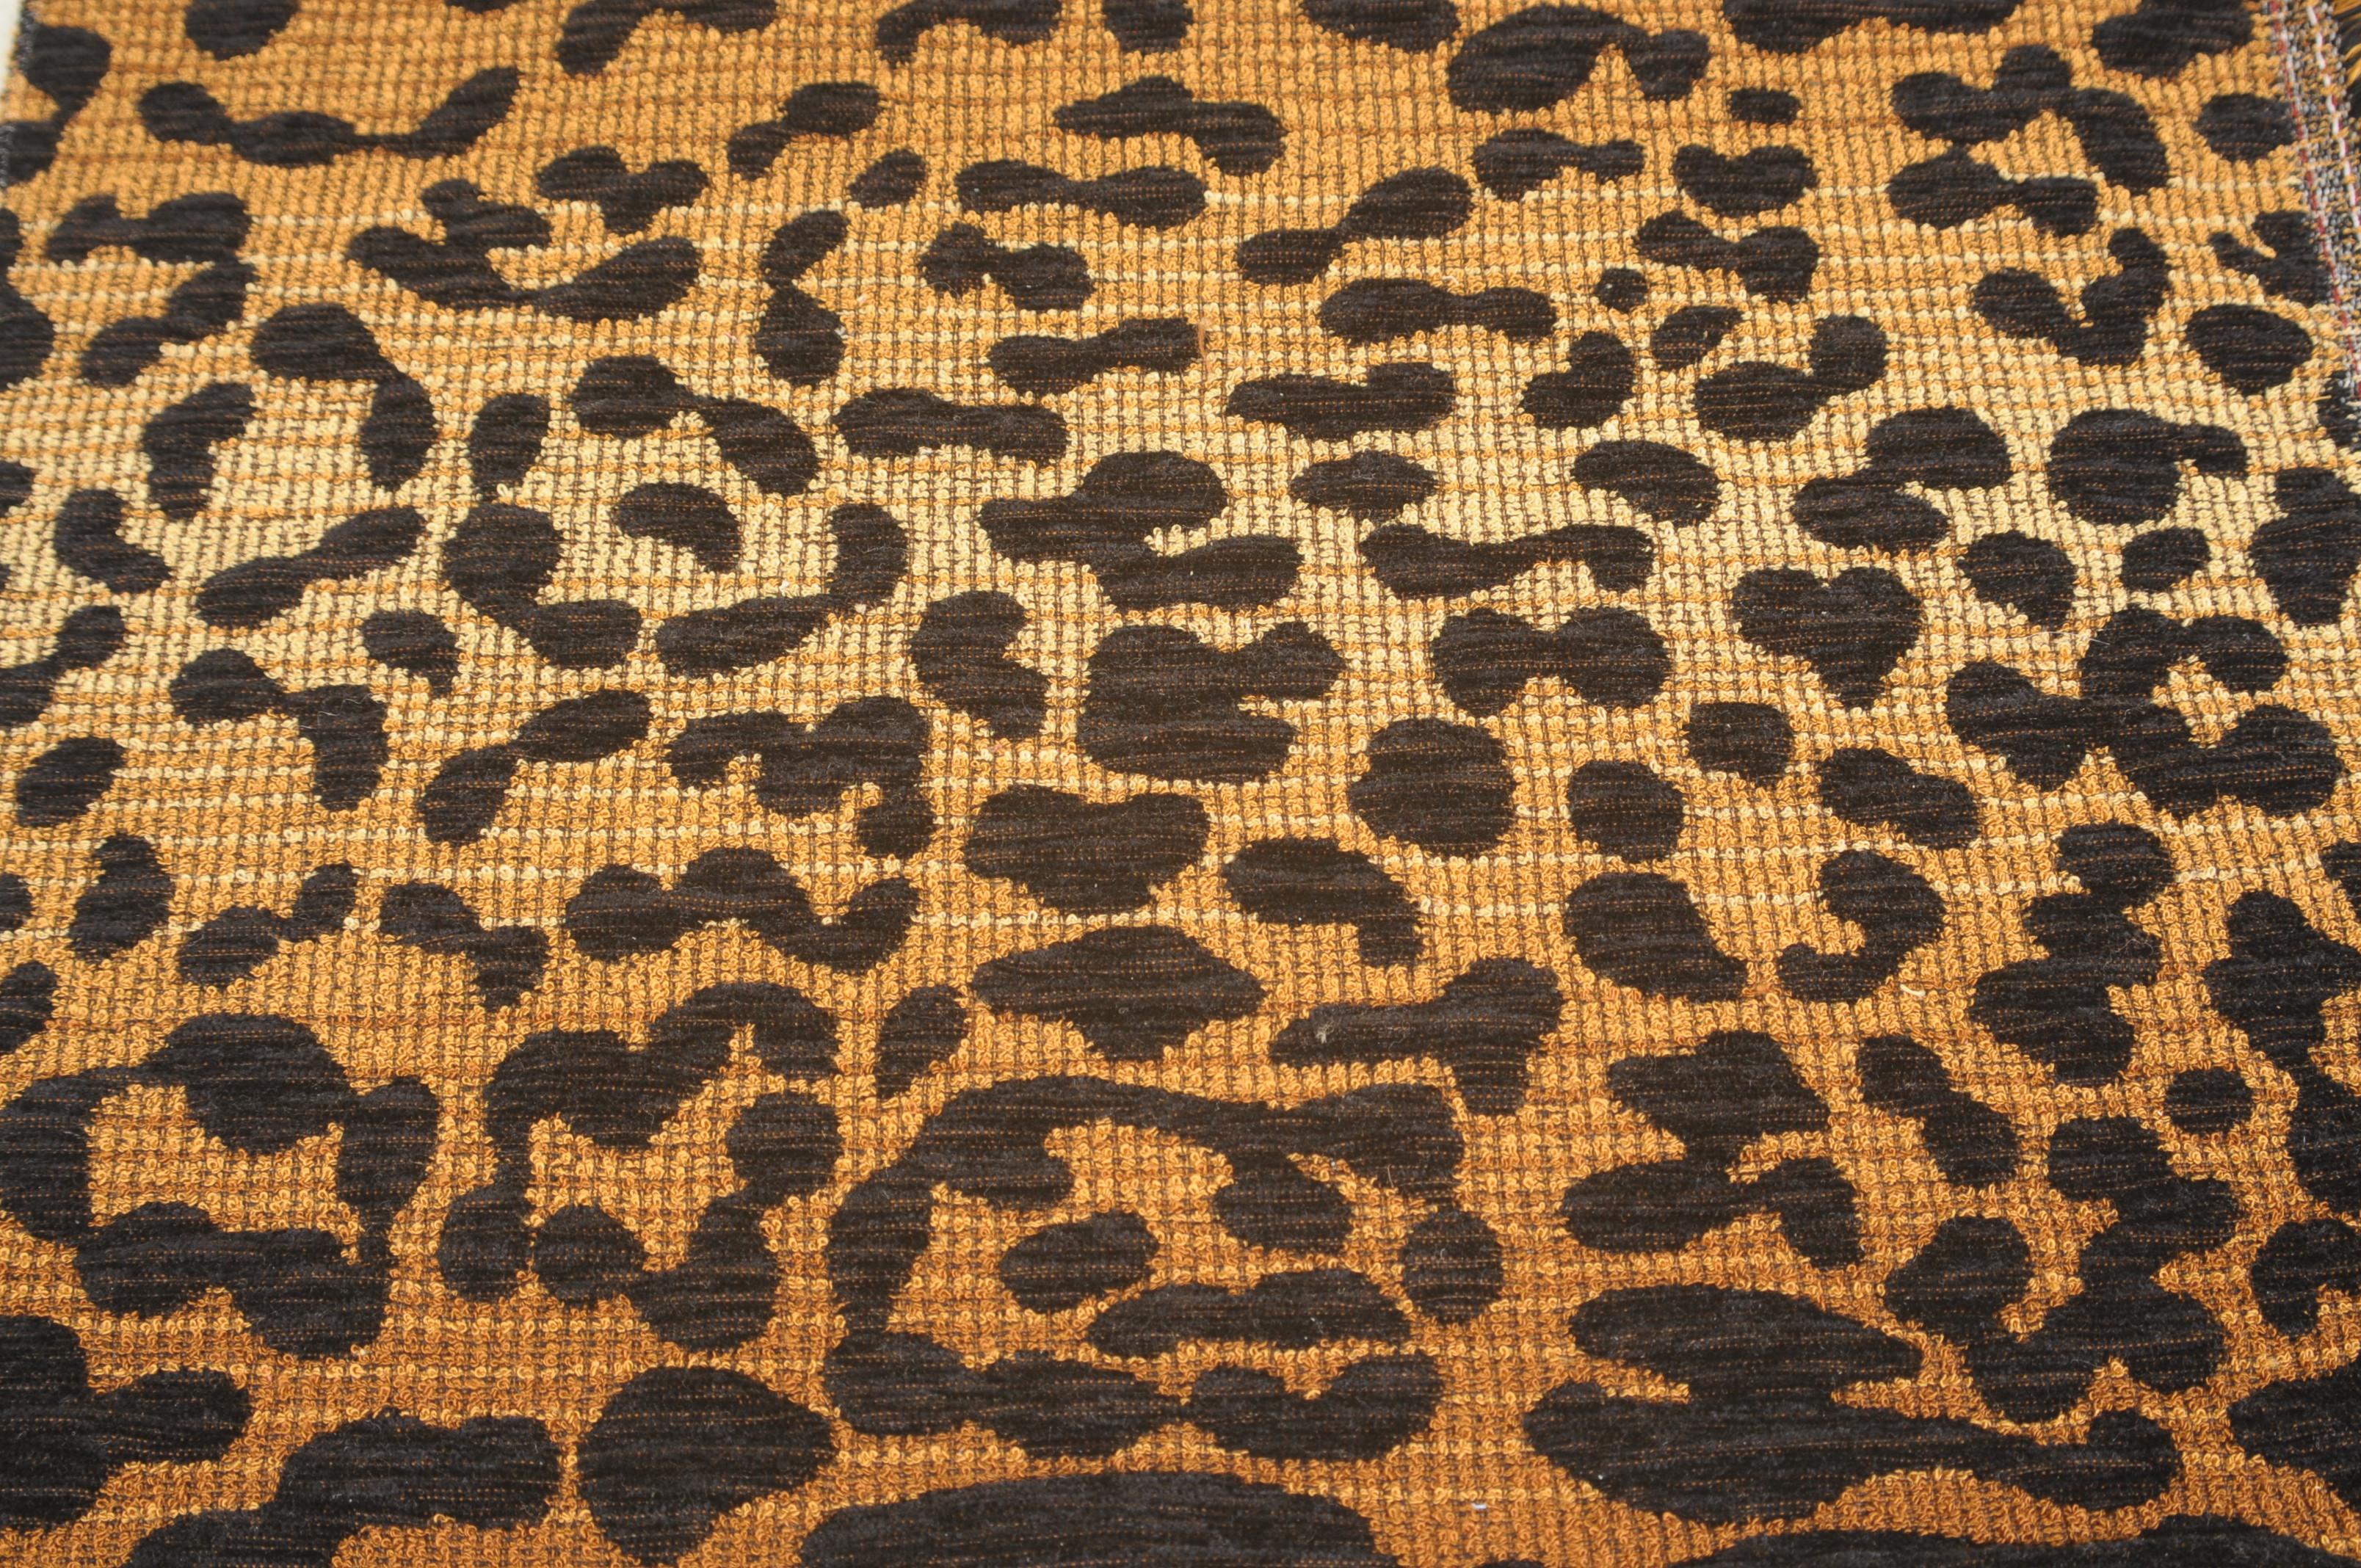 Tiger Fabric, not Le Tigre